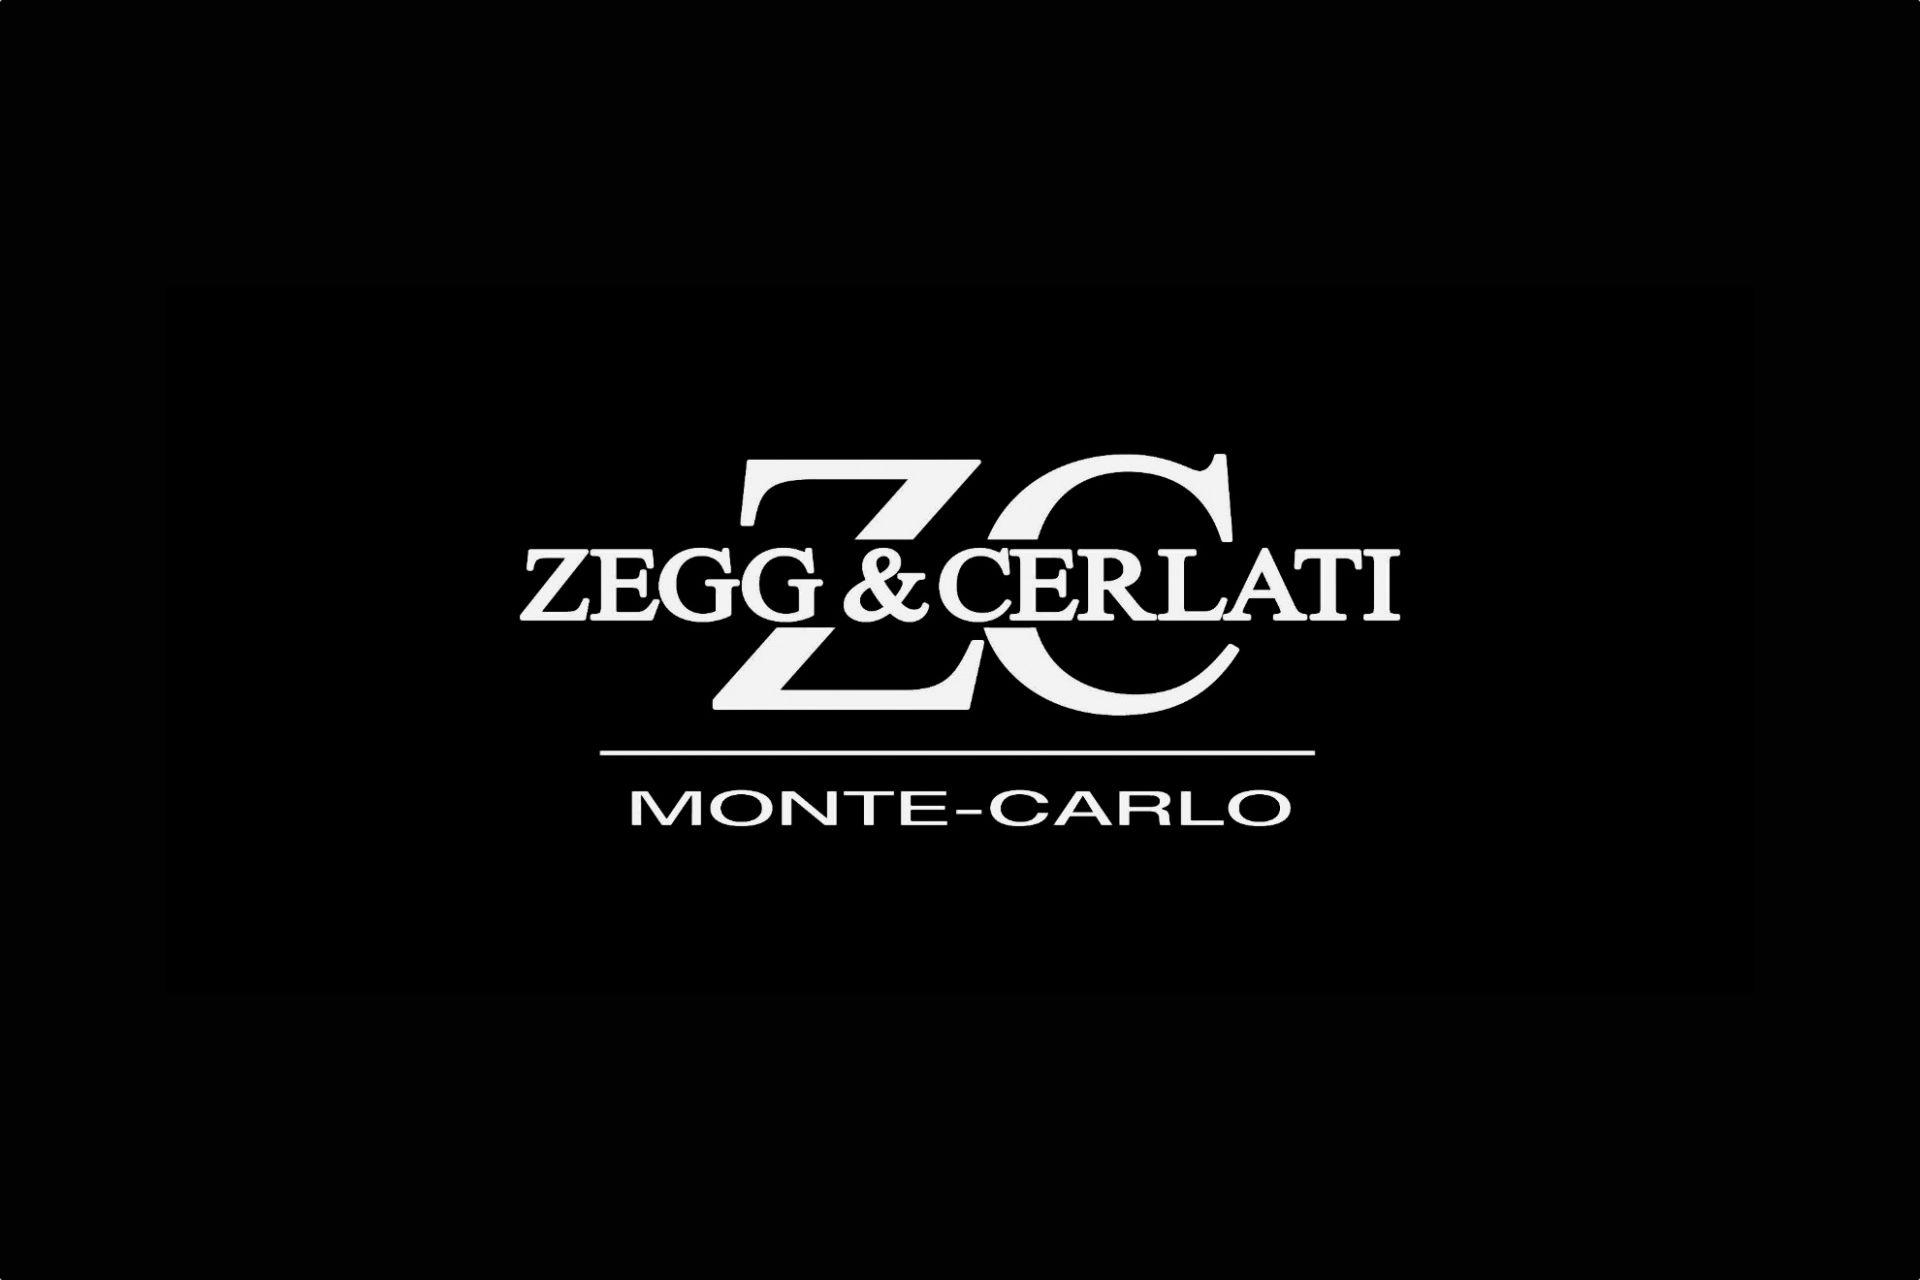 Zegg & Cerlati